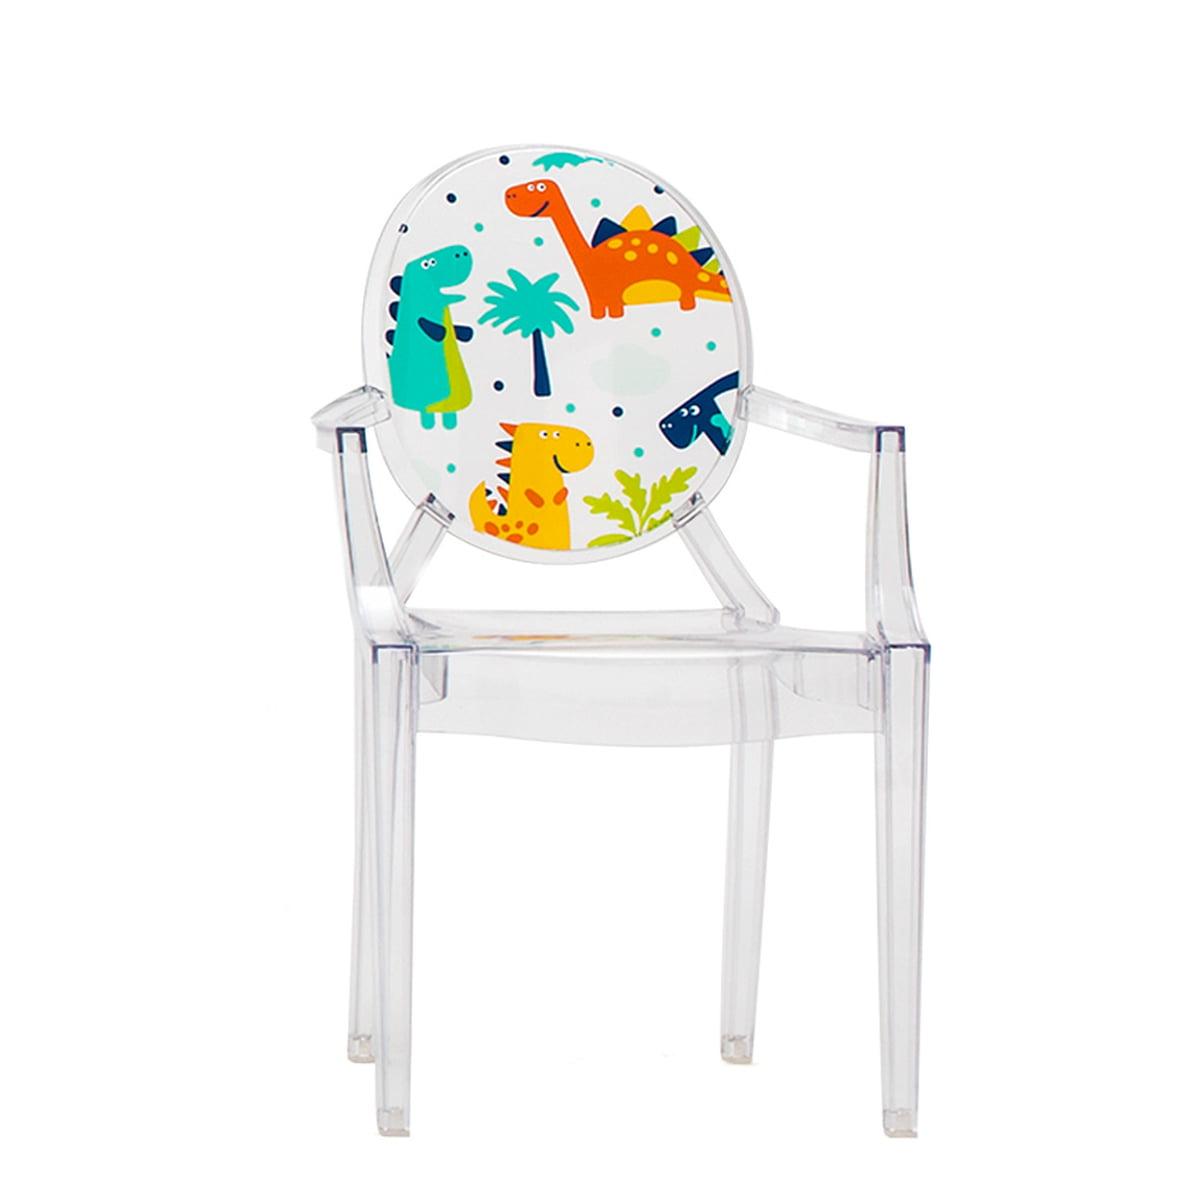 Kartell - Lou Lou Ghost Kinderstuhl, transparent / Dinosaurier | Kinderzimmer > Kinderzimmerstühle > Kinderstühle | Verschiedene farben | Kartell